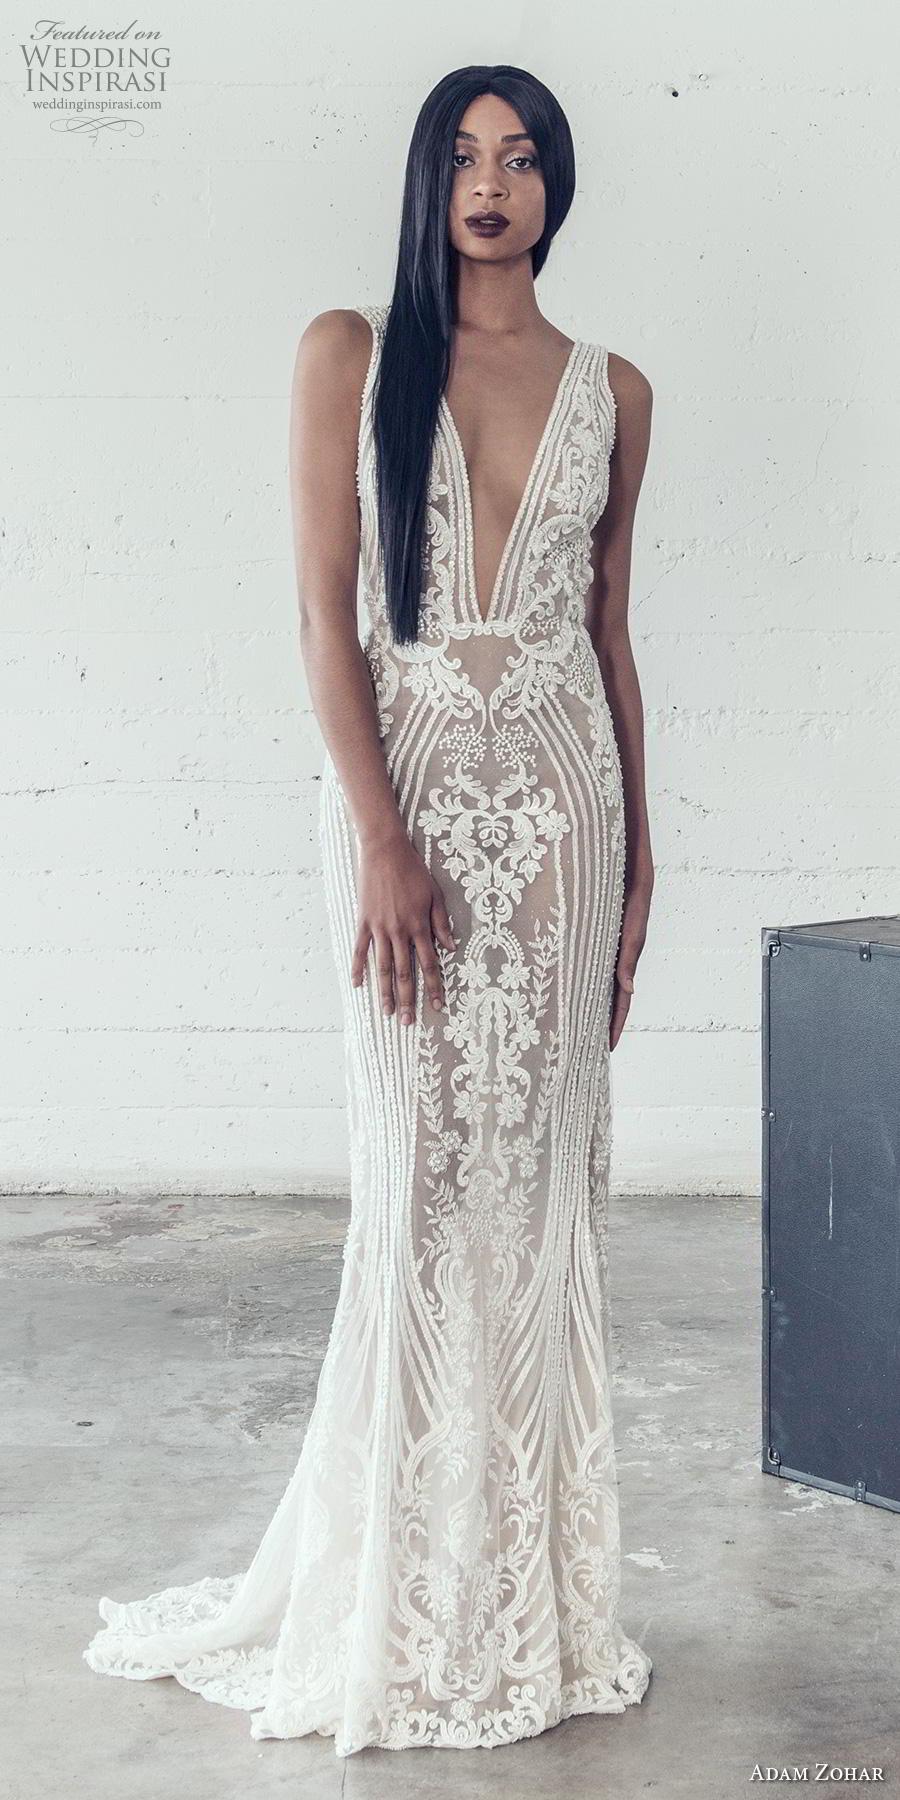 adam zohar 2019 bridal sleeveless deep v neck full embellishment sexy glamorous sheath fit and flare wedding dress backless v back sweep train (13) mv